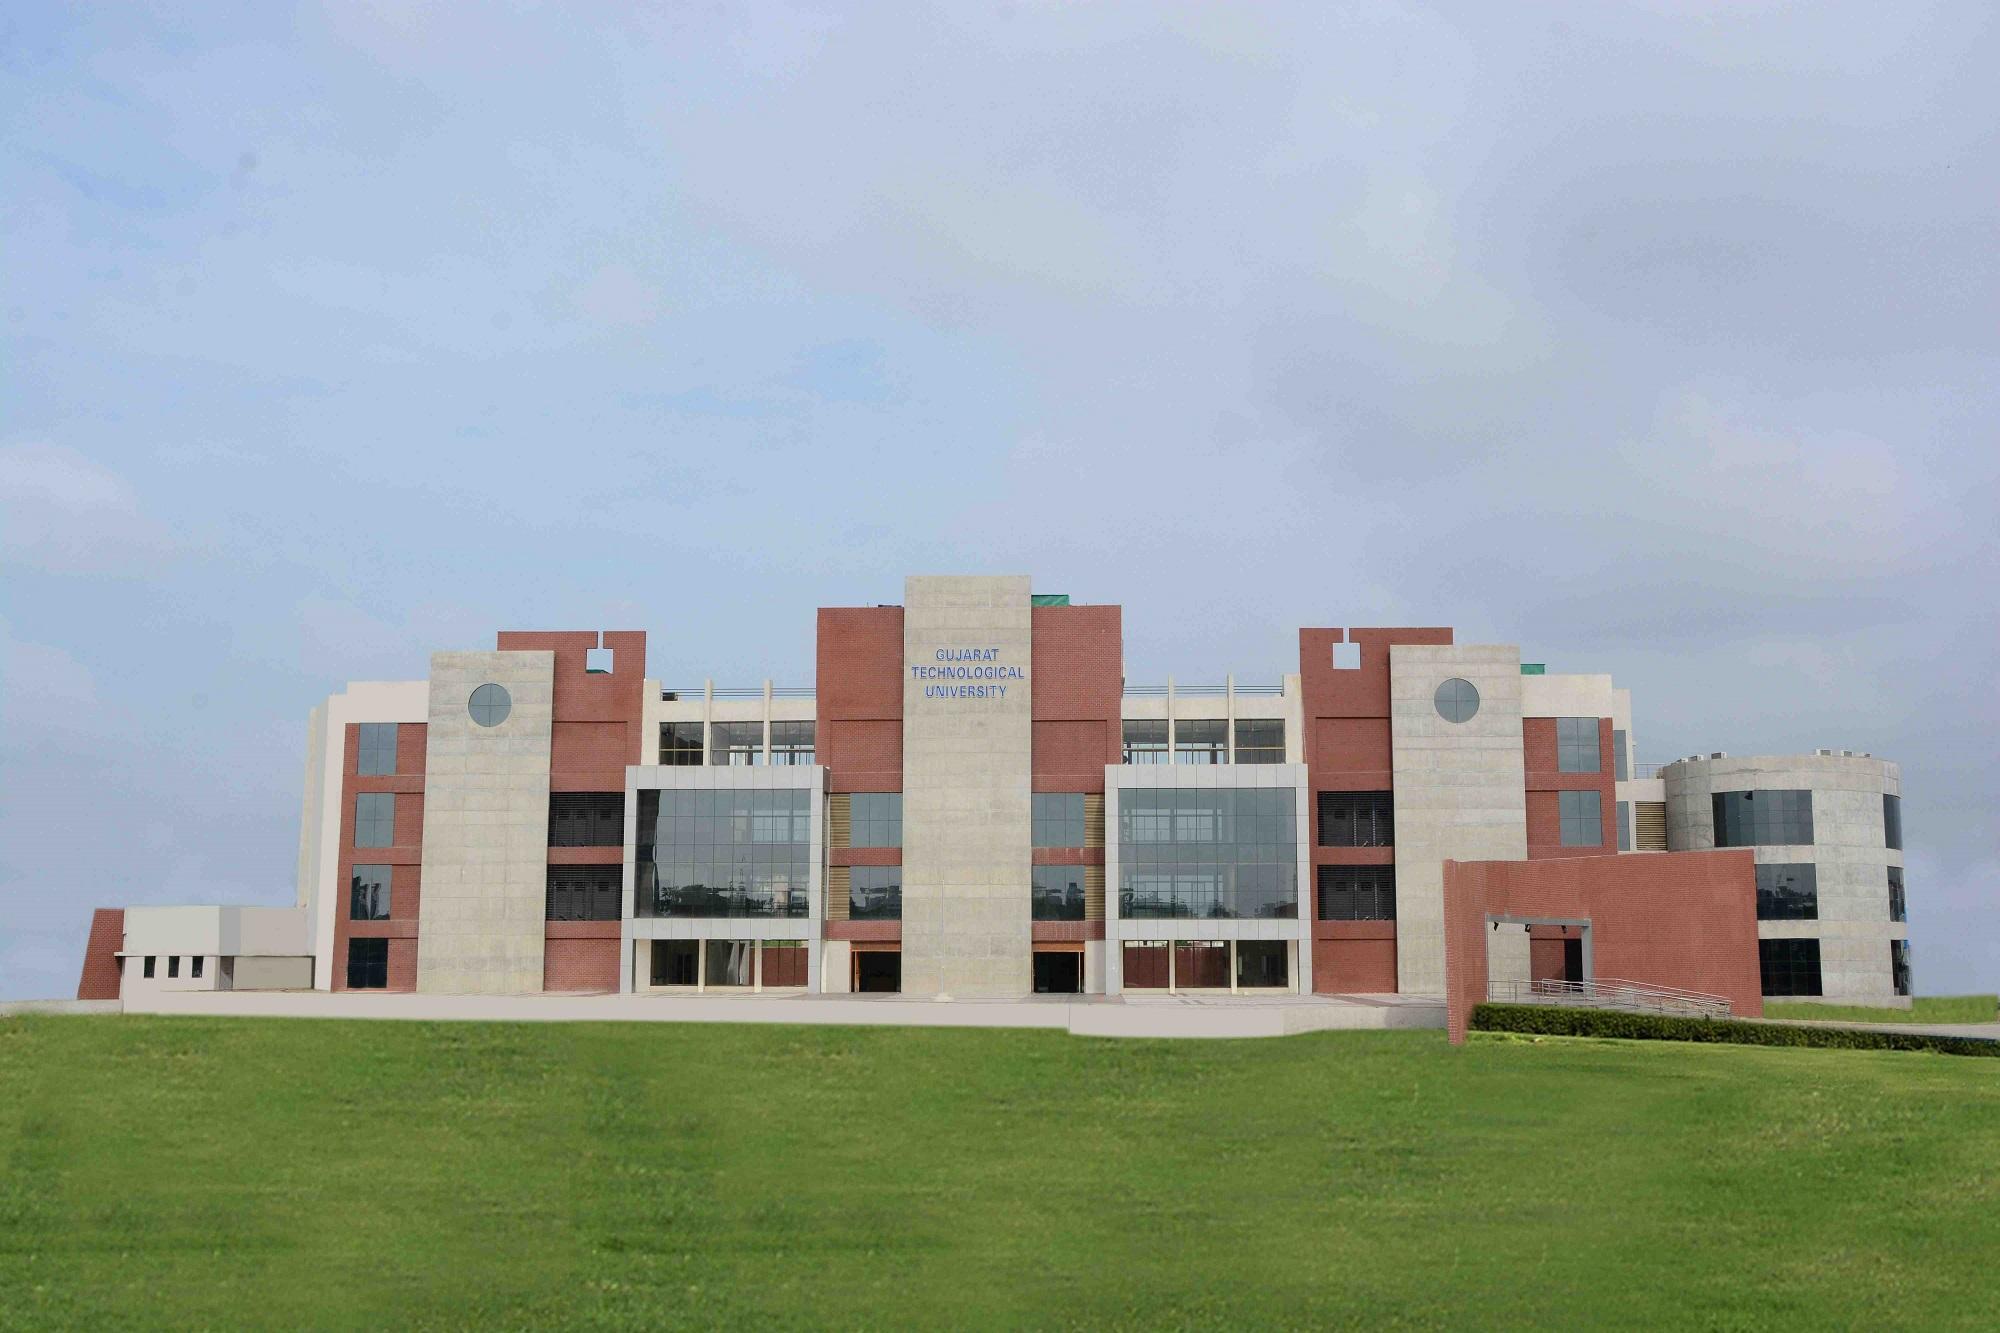 GTU (Gujarat Technlogical University)